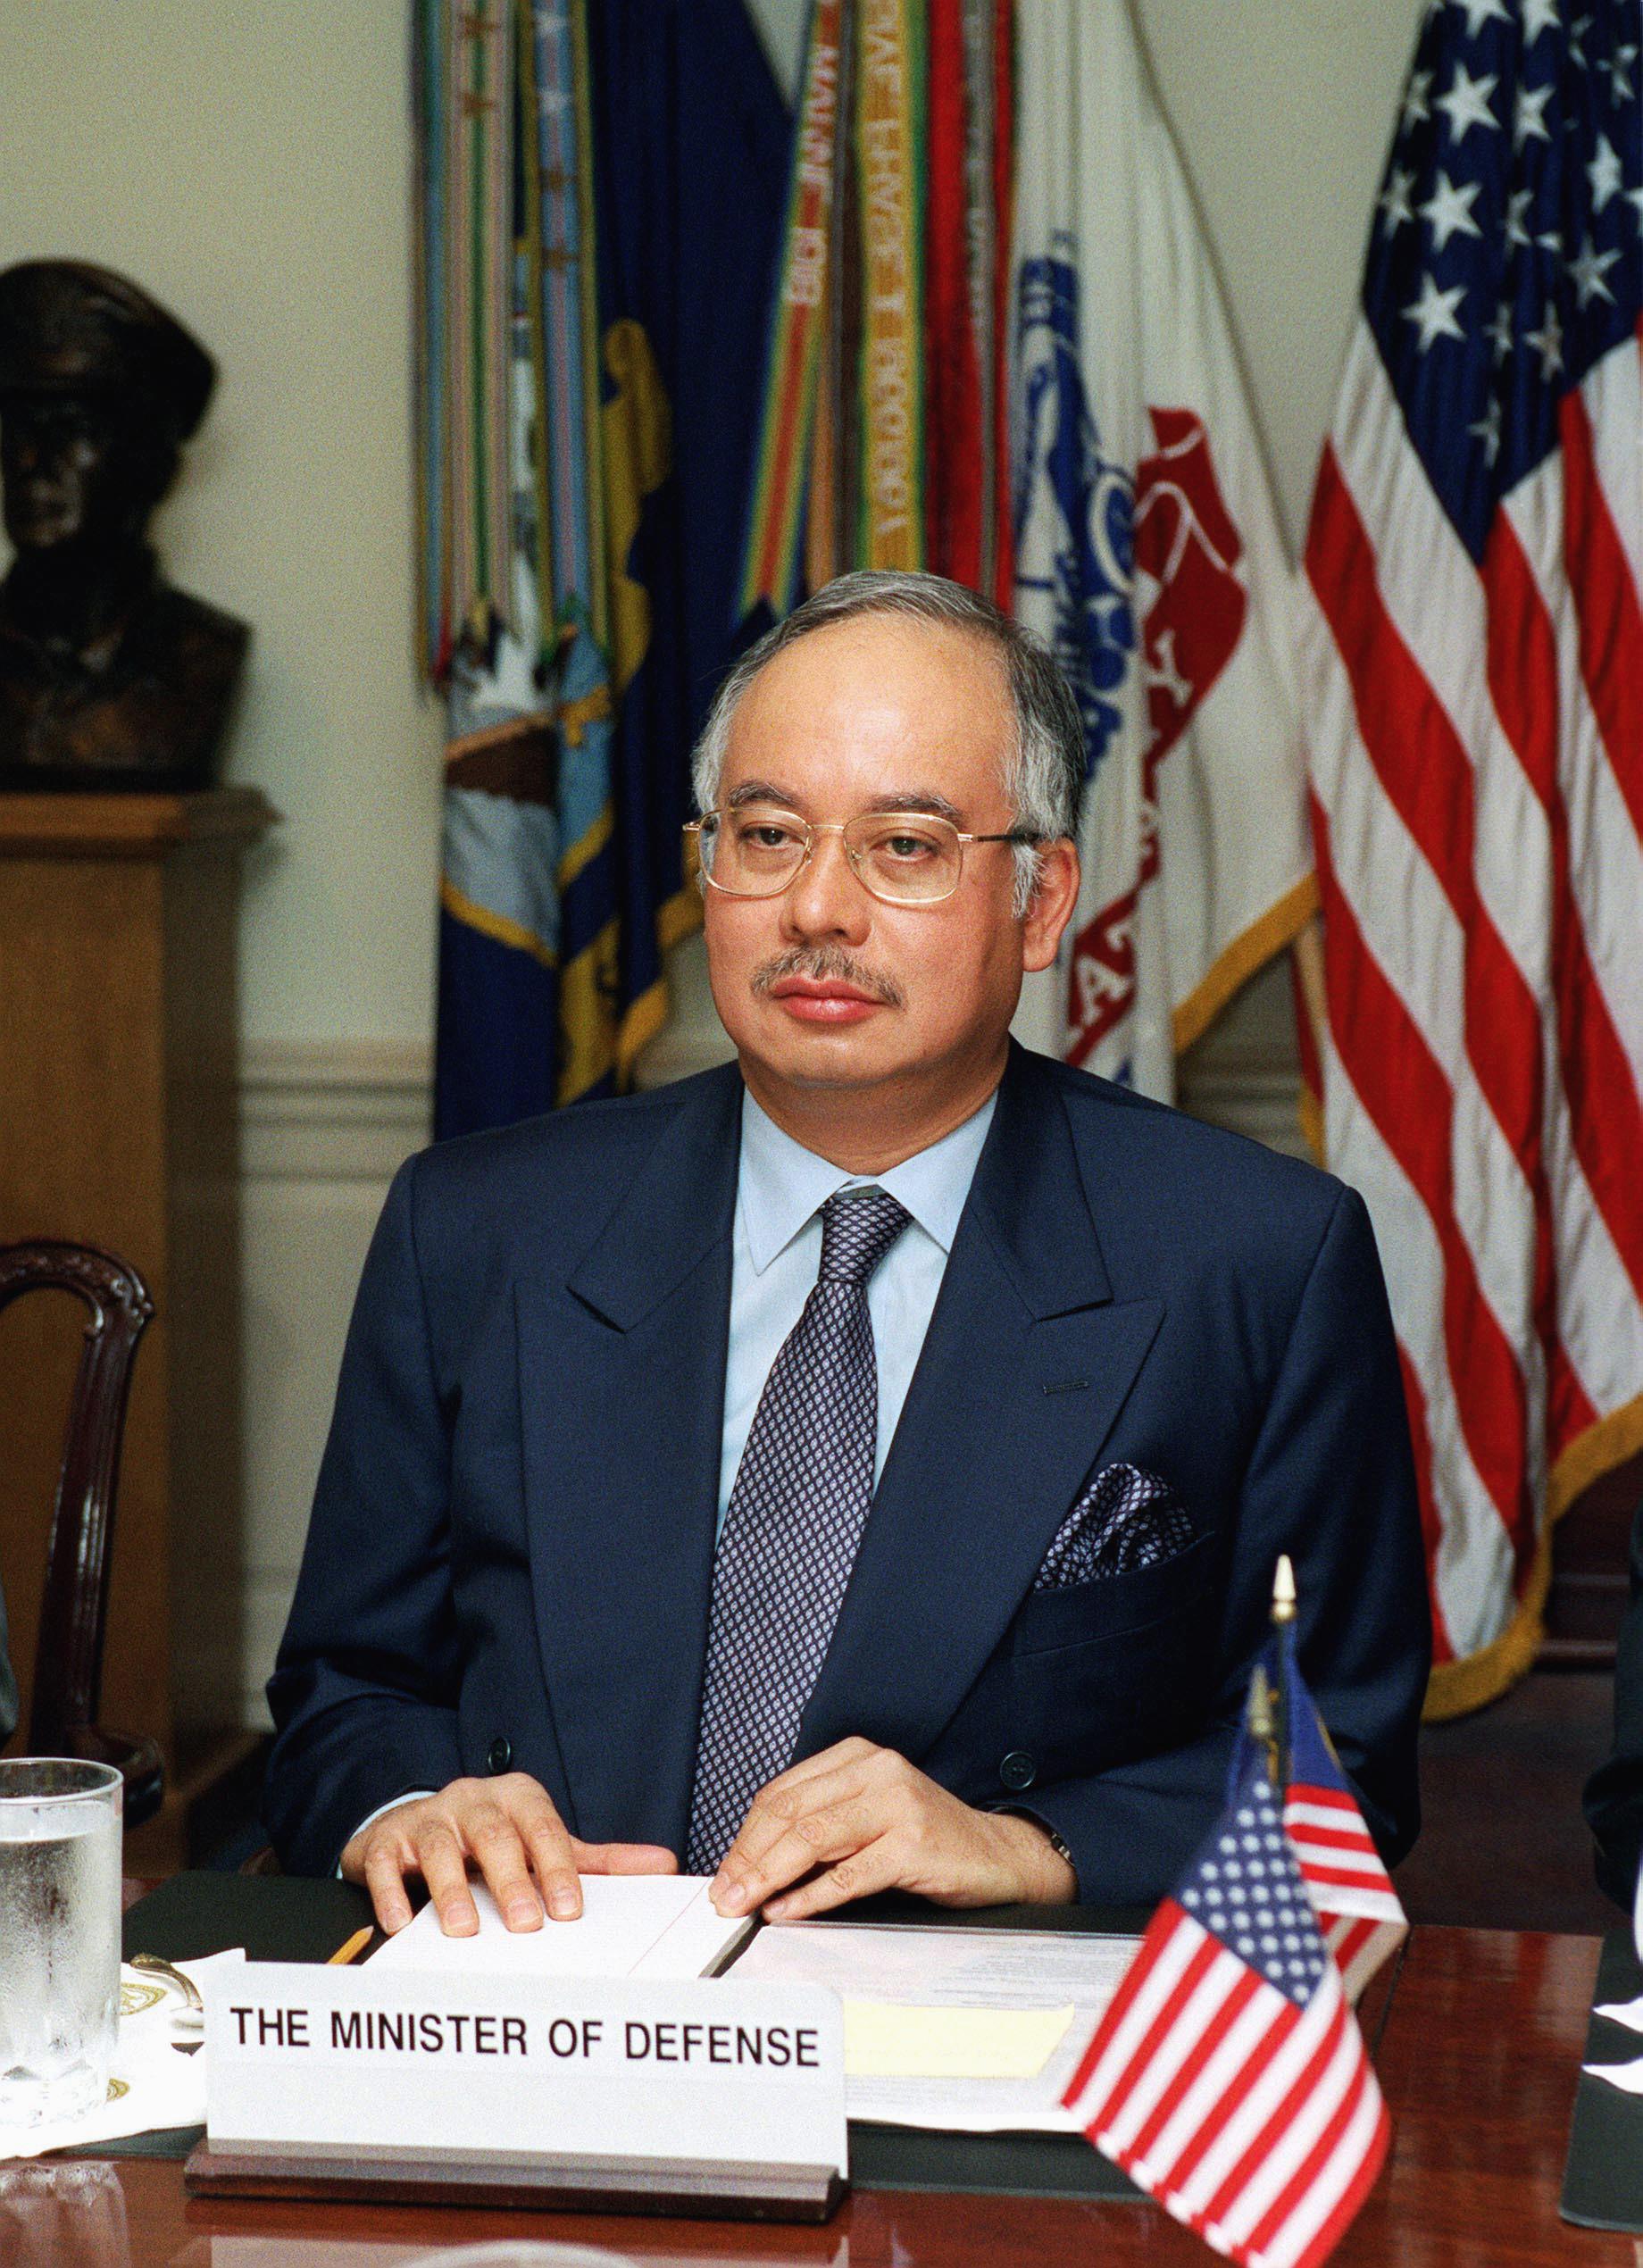 1MDB / Goldman Sachs Scandal